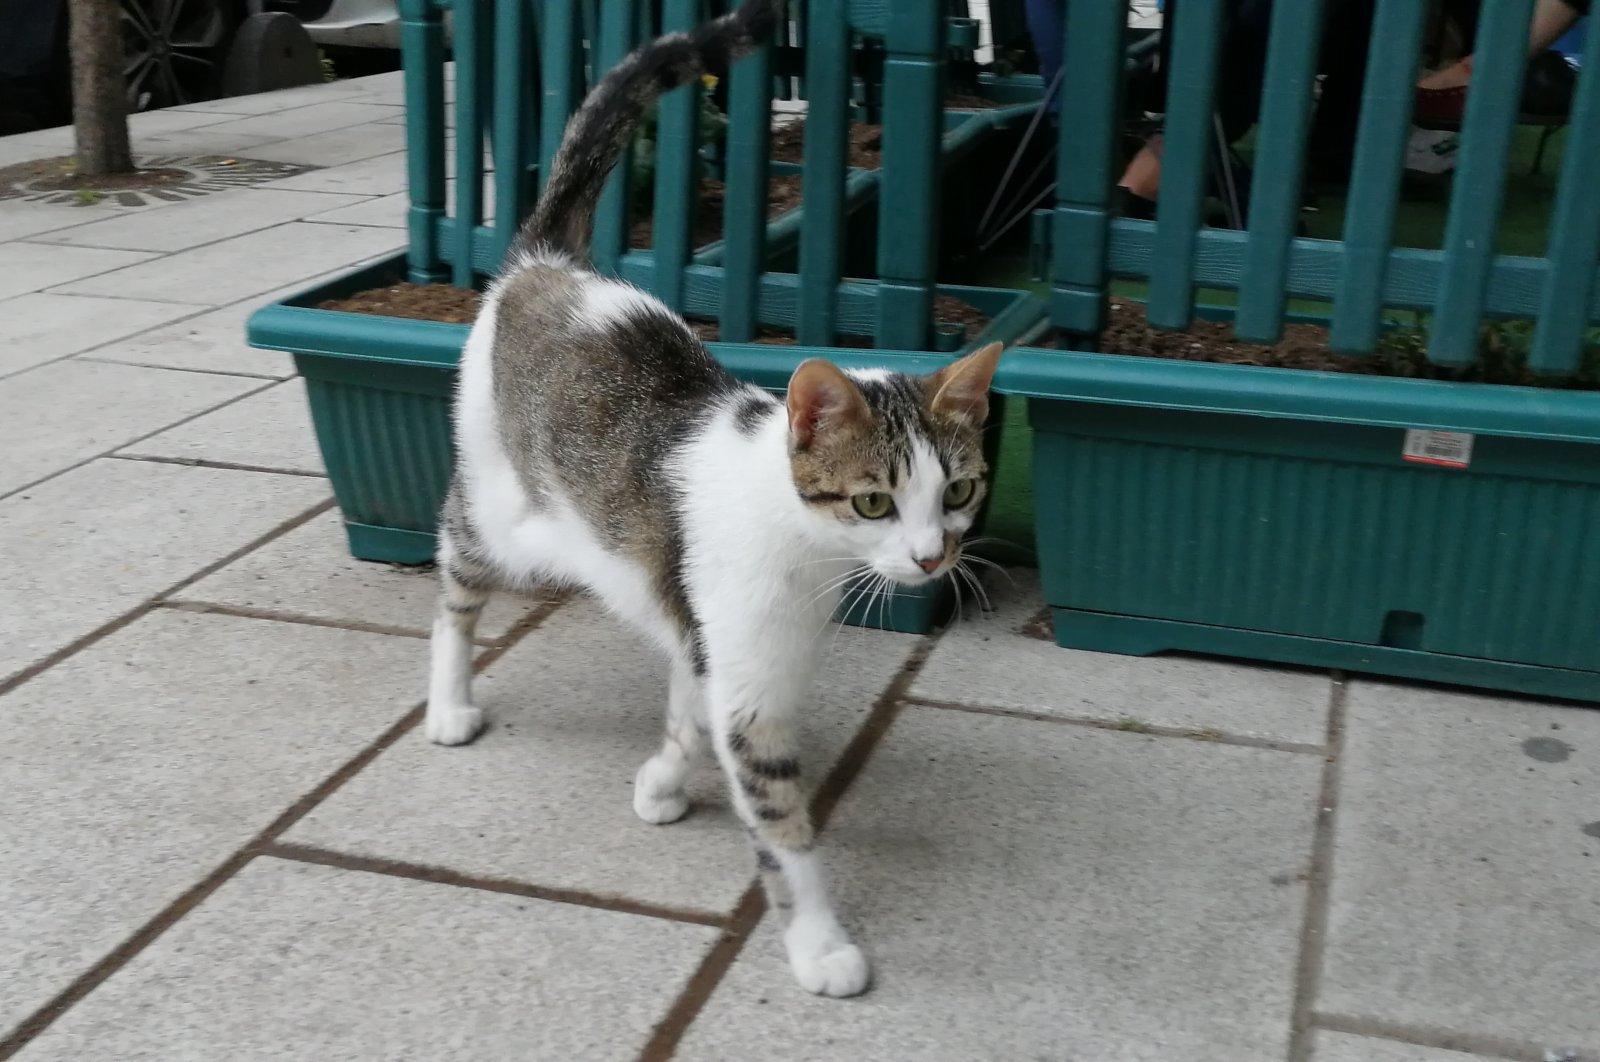 A cat walking in the neighborhood where kittens were killed, in Istanbul, Turkey, June 15, 2021. (DHA Photo)